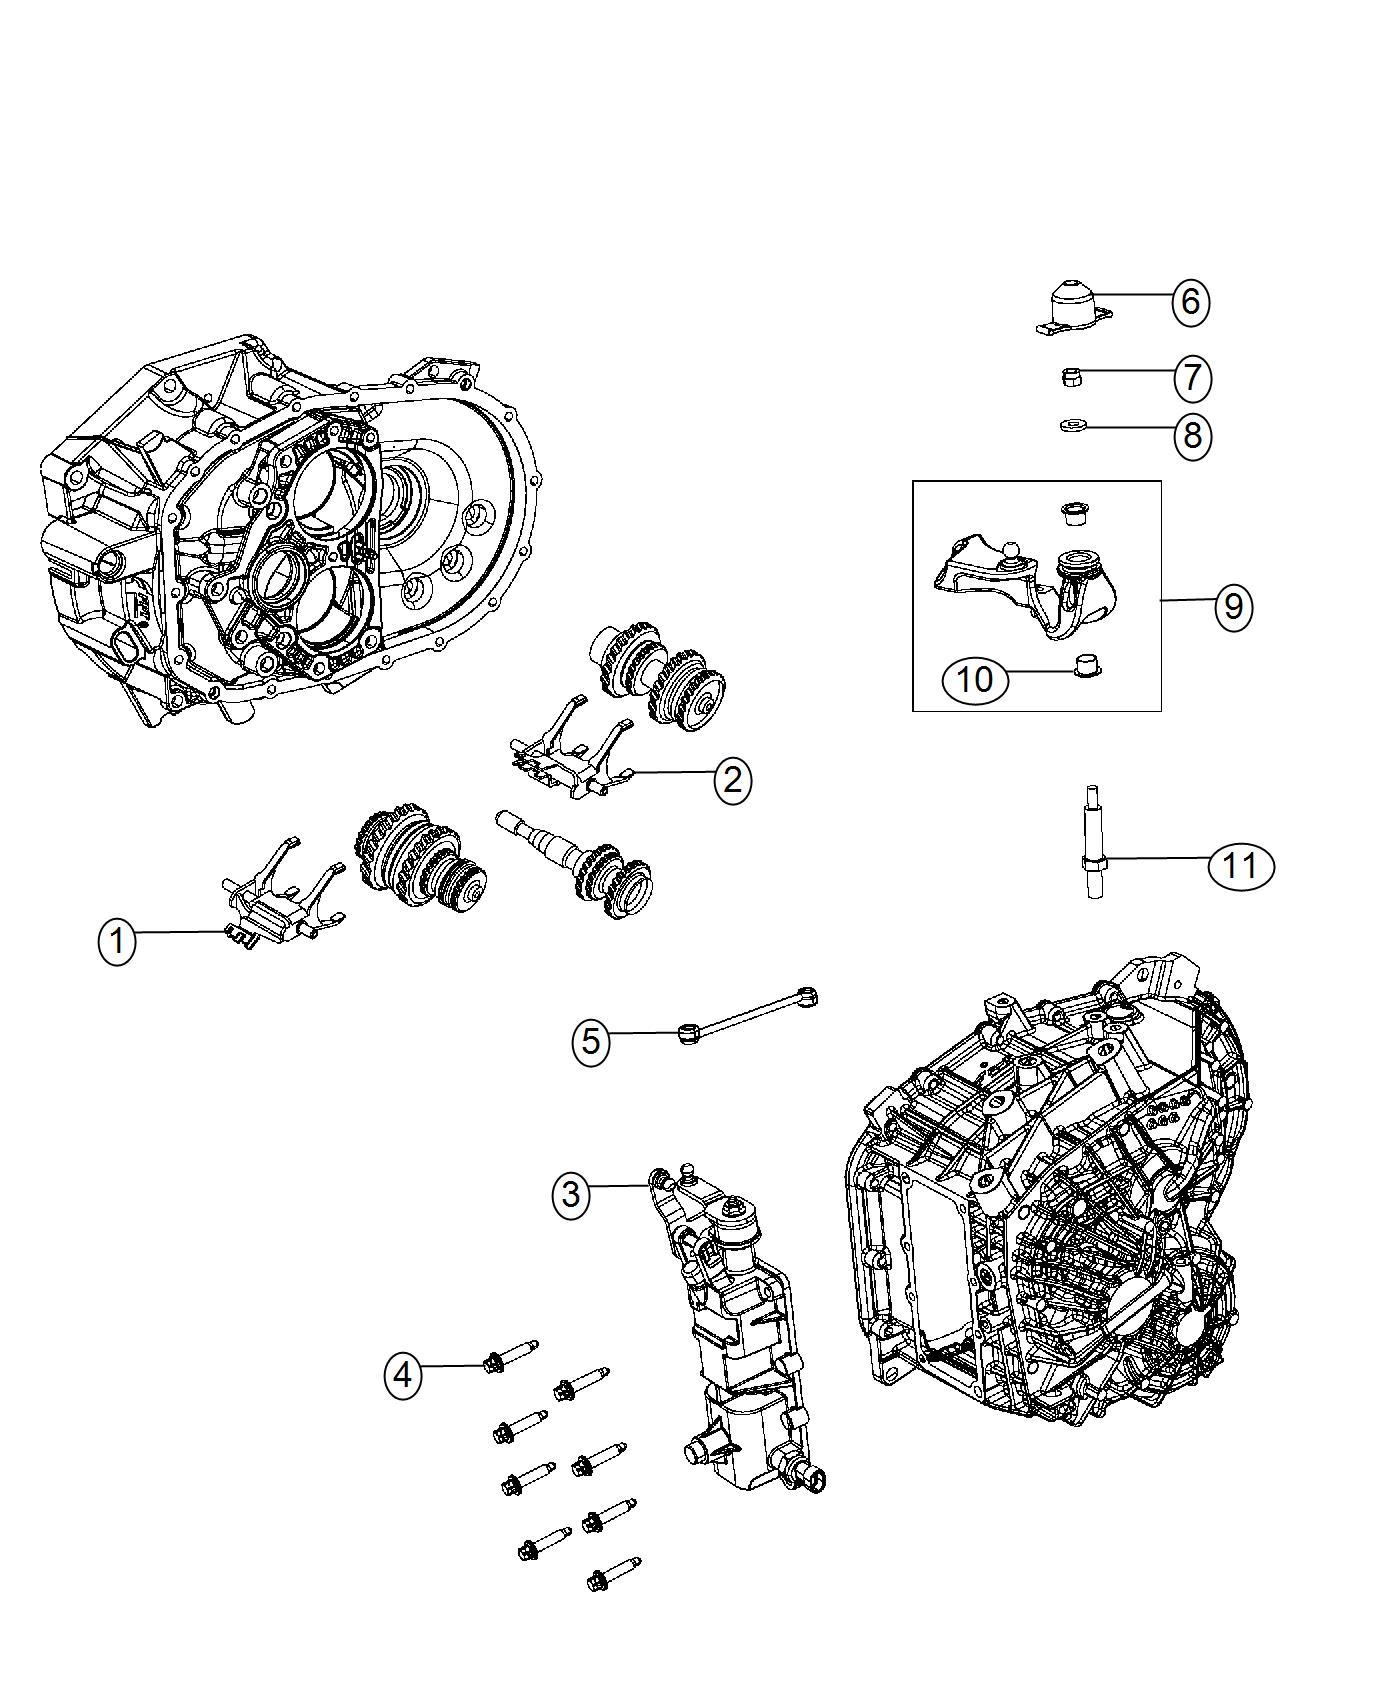 Jeep Renegade Rod Gear Shift Control 4 438 Final